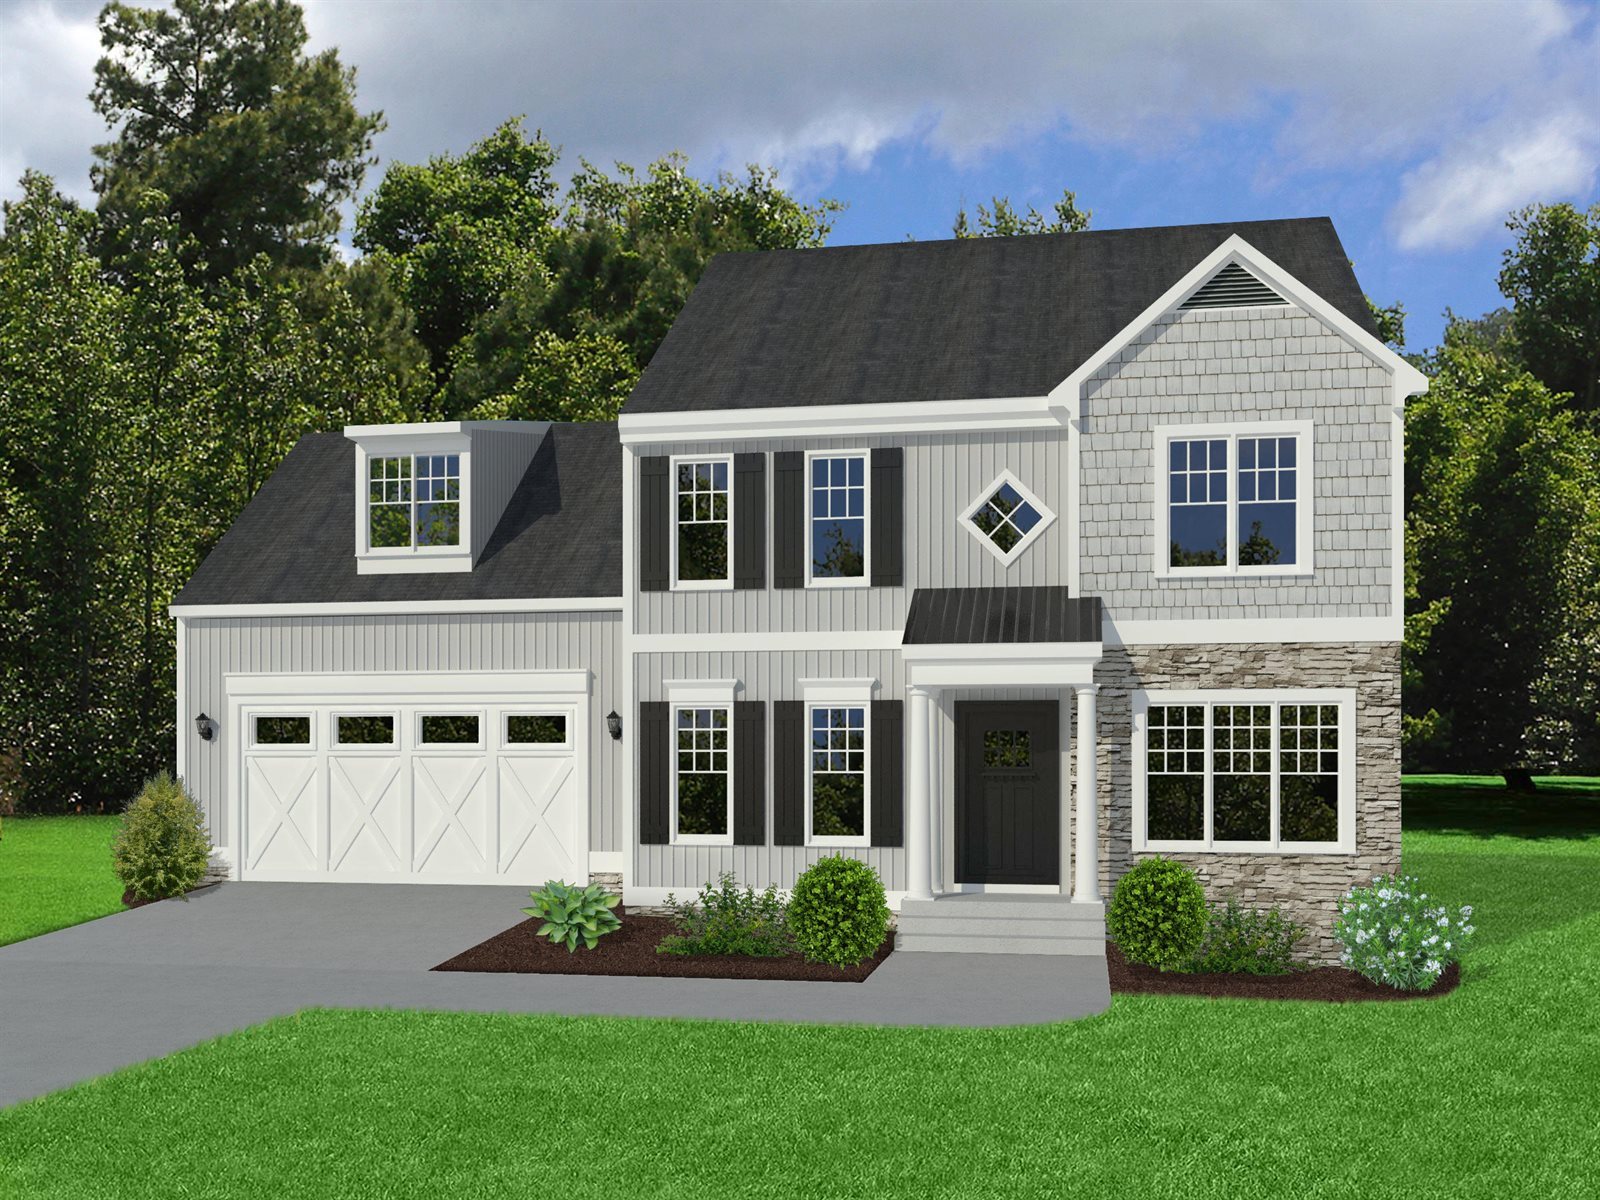 7055 Fairway Ridge Ct, Roanoke, VA 24018